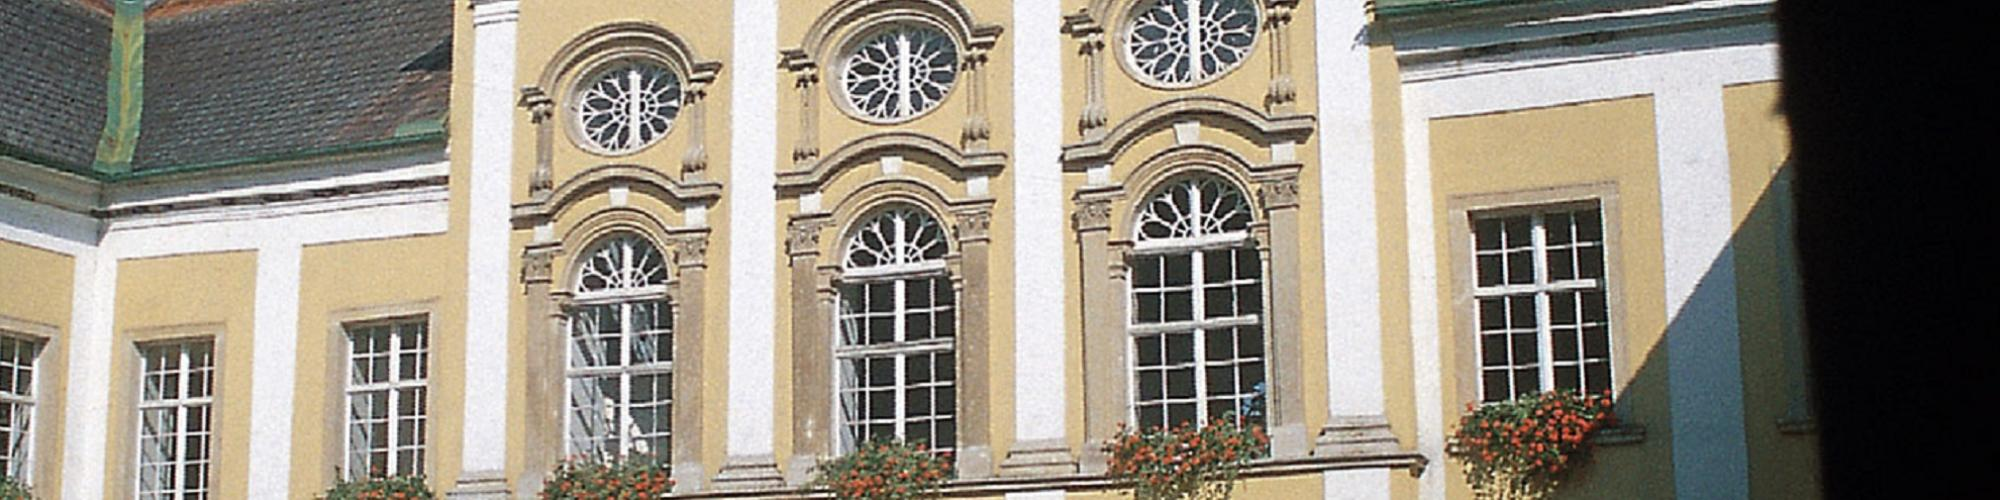 Weingut Schloss Gobelsburg GmbH